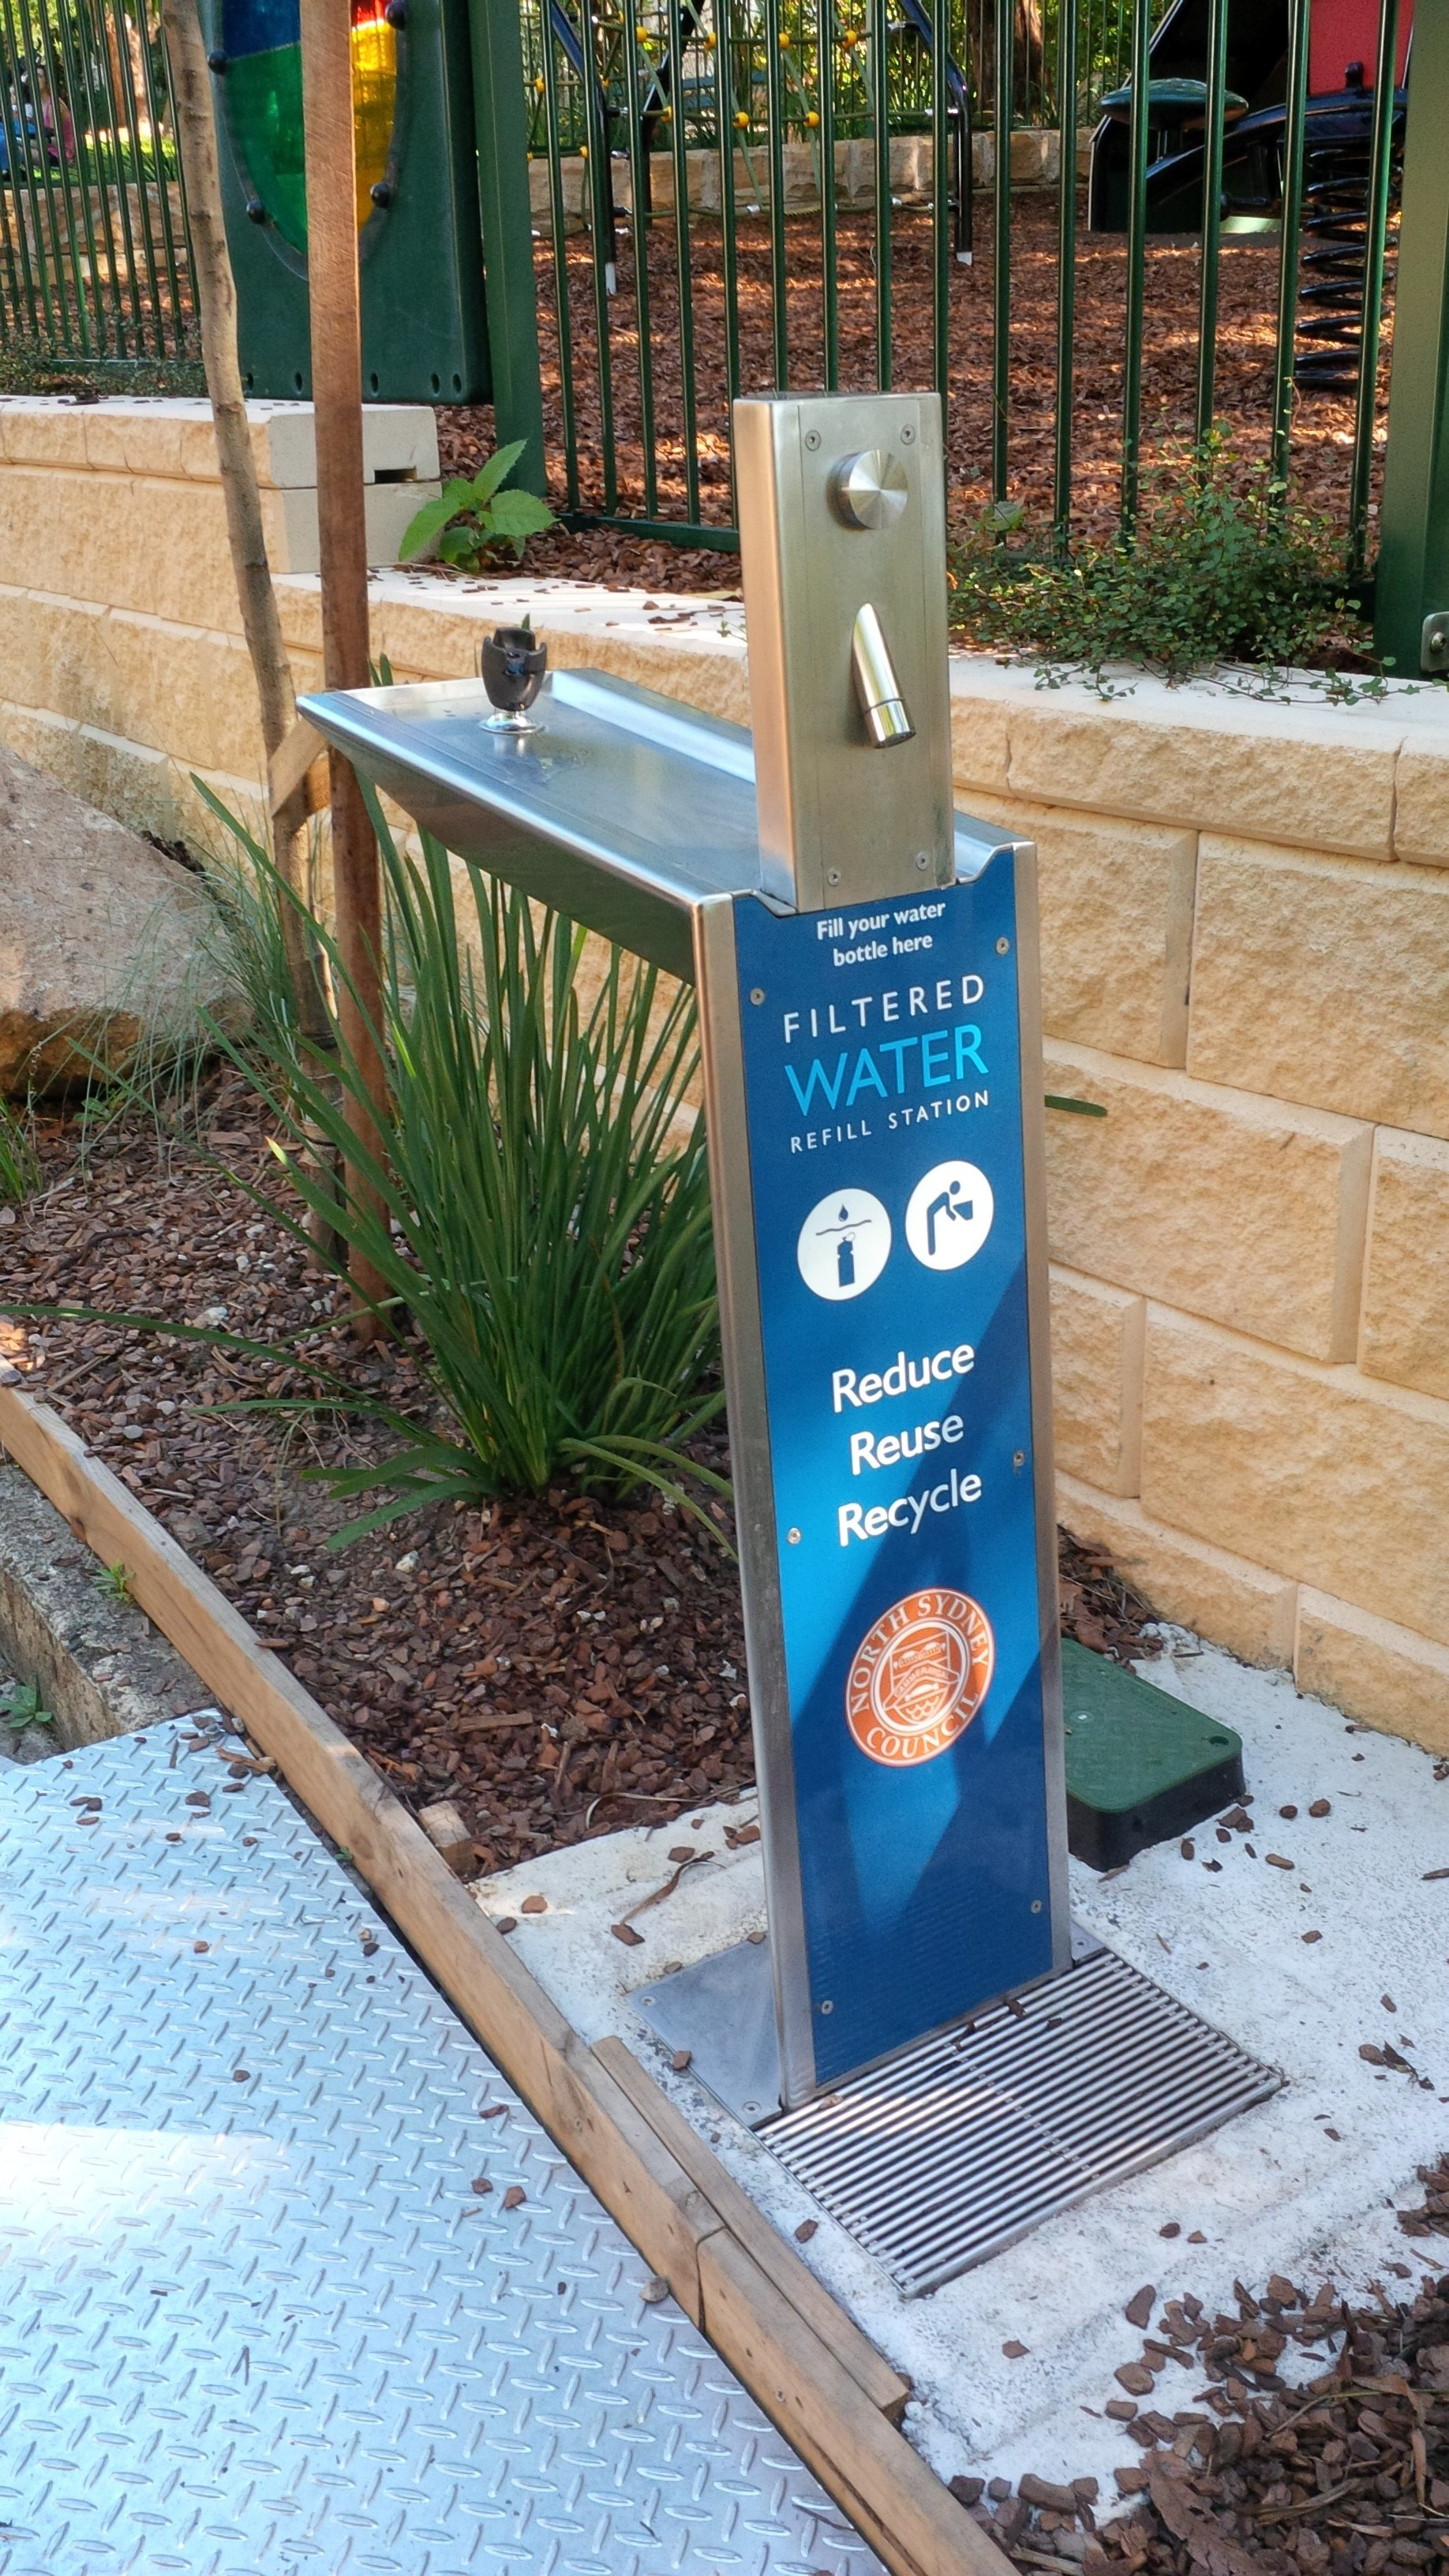 Aquafil Water Station Scully Outdoor Designs Australia